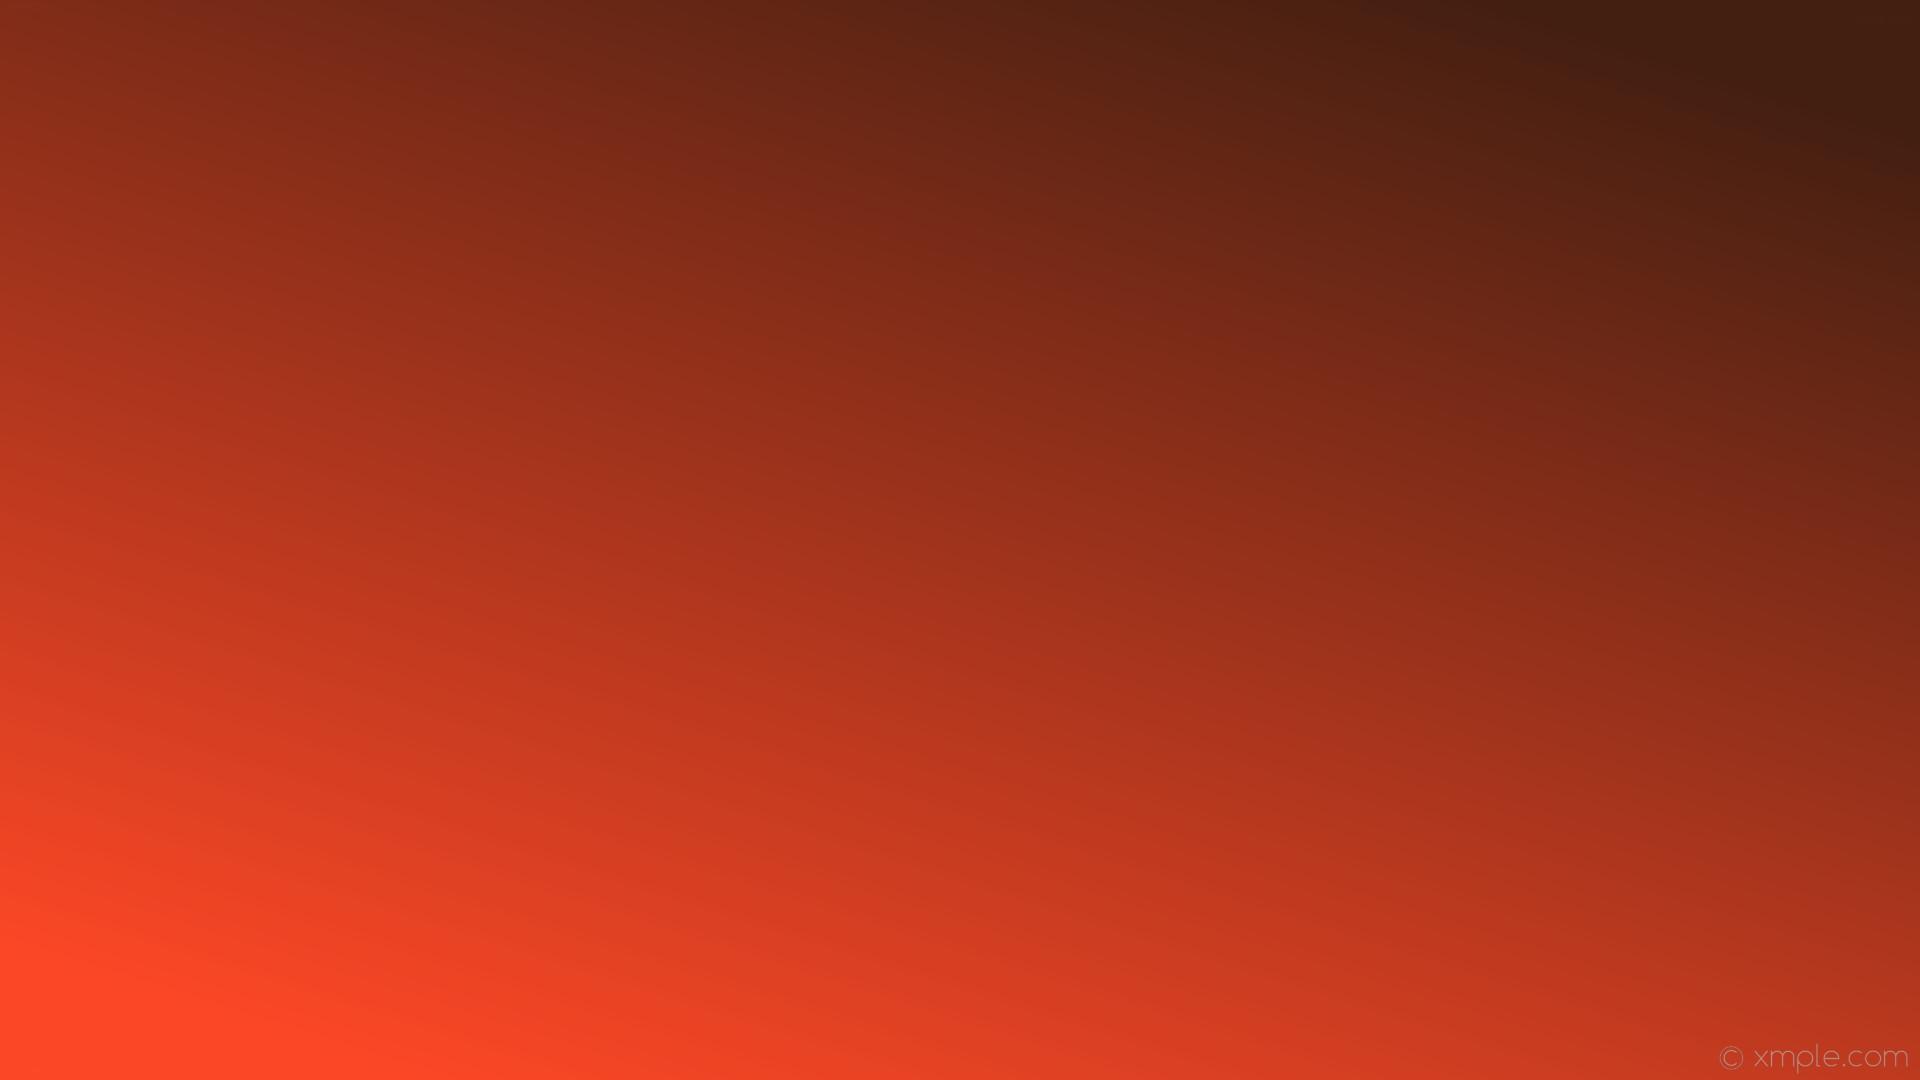 wallpaper linear orange gradient red dark orange #431f11 #fb4726 45°